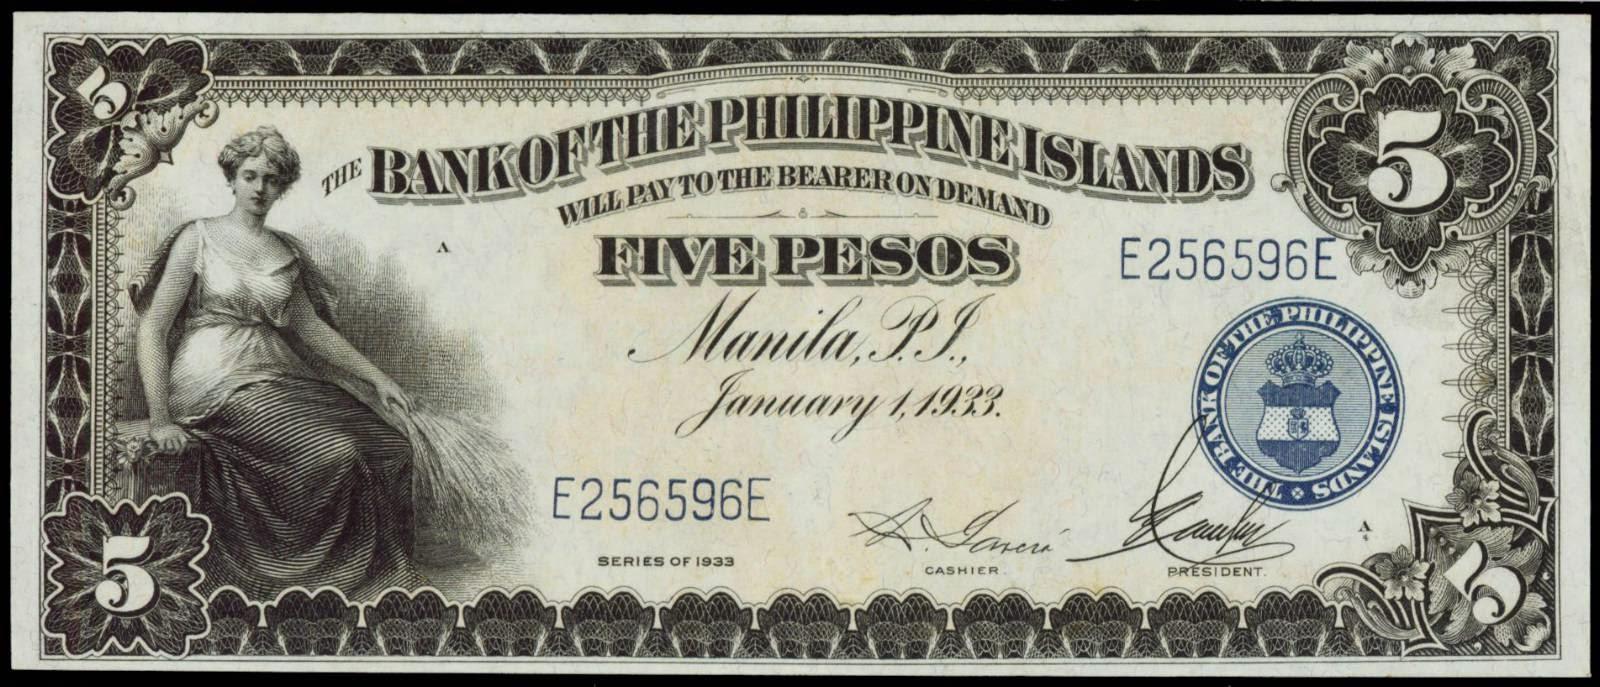 Philippines banknotes 5 Pesos Philippine Note 1933